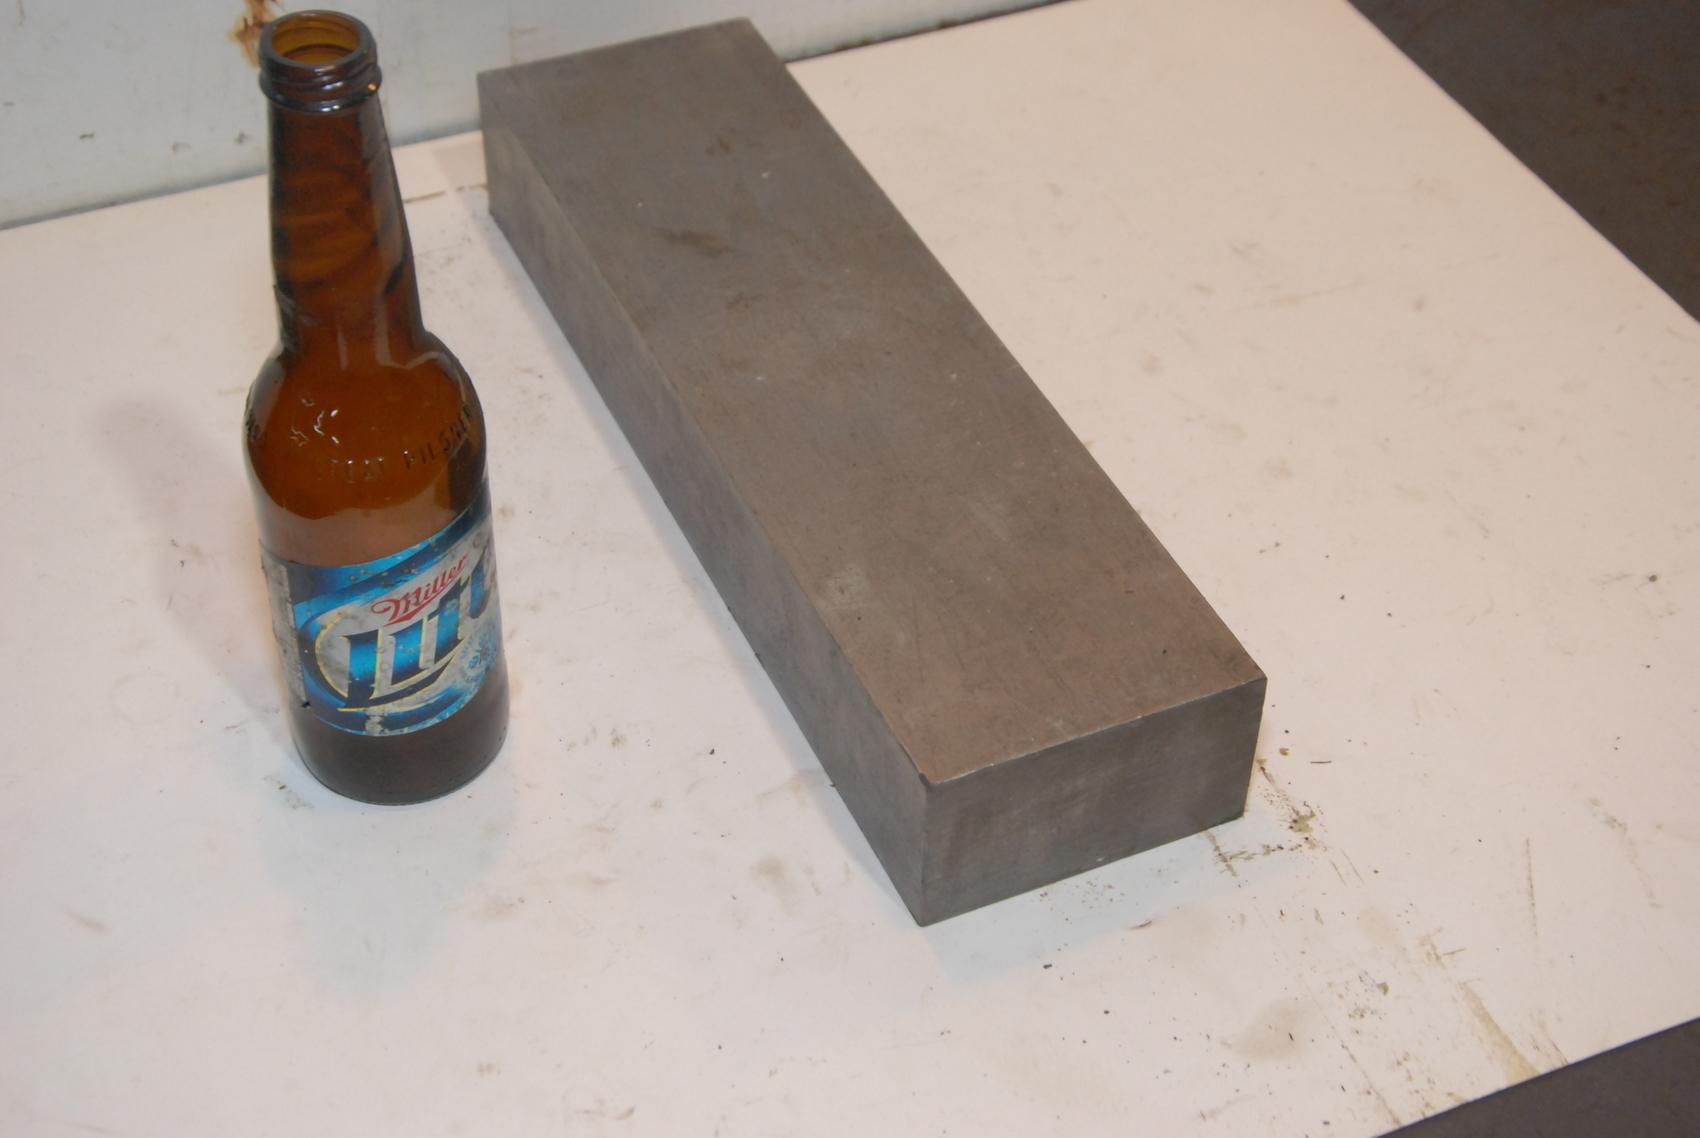 Steel Rectangular Bar for blacksmith anvil,14*4*2,35lbs